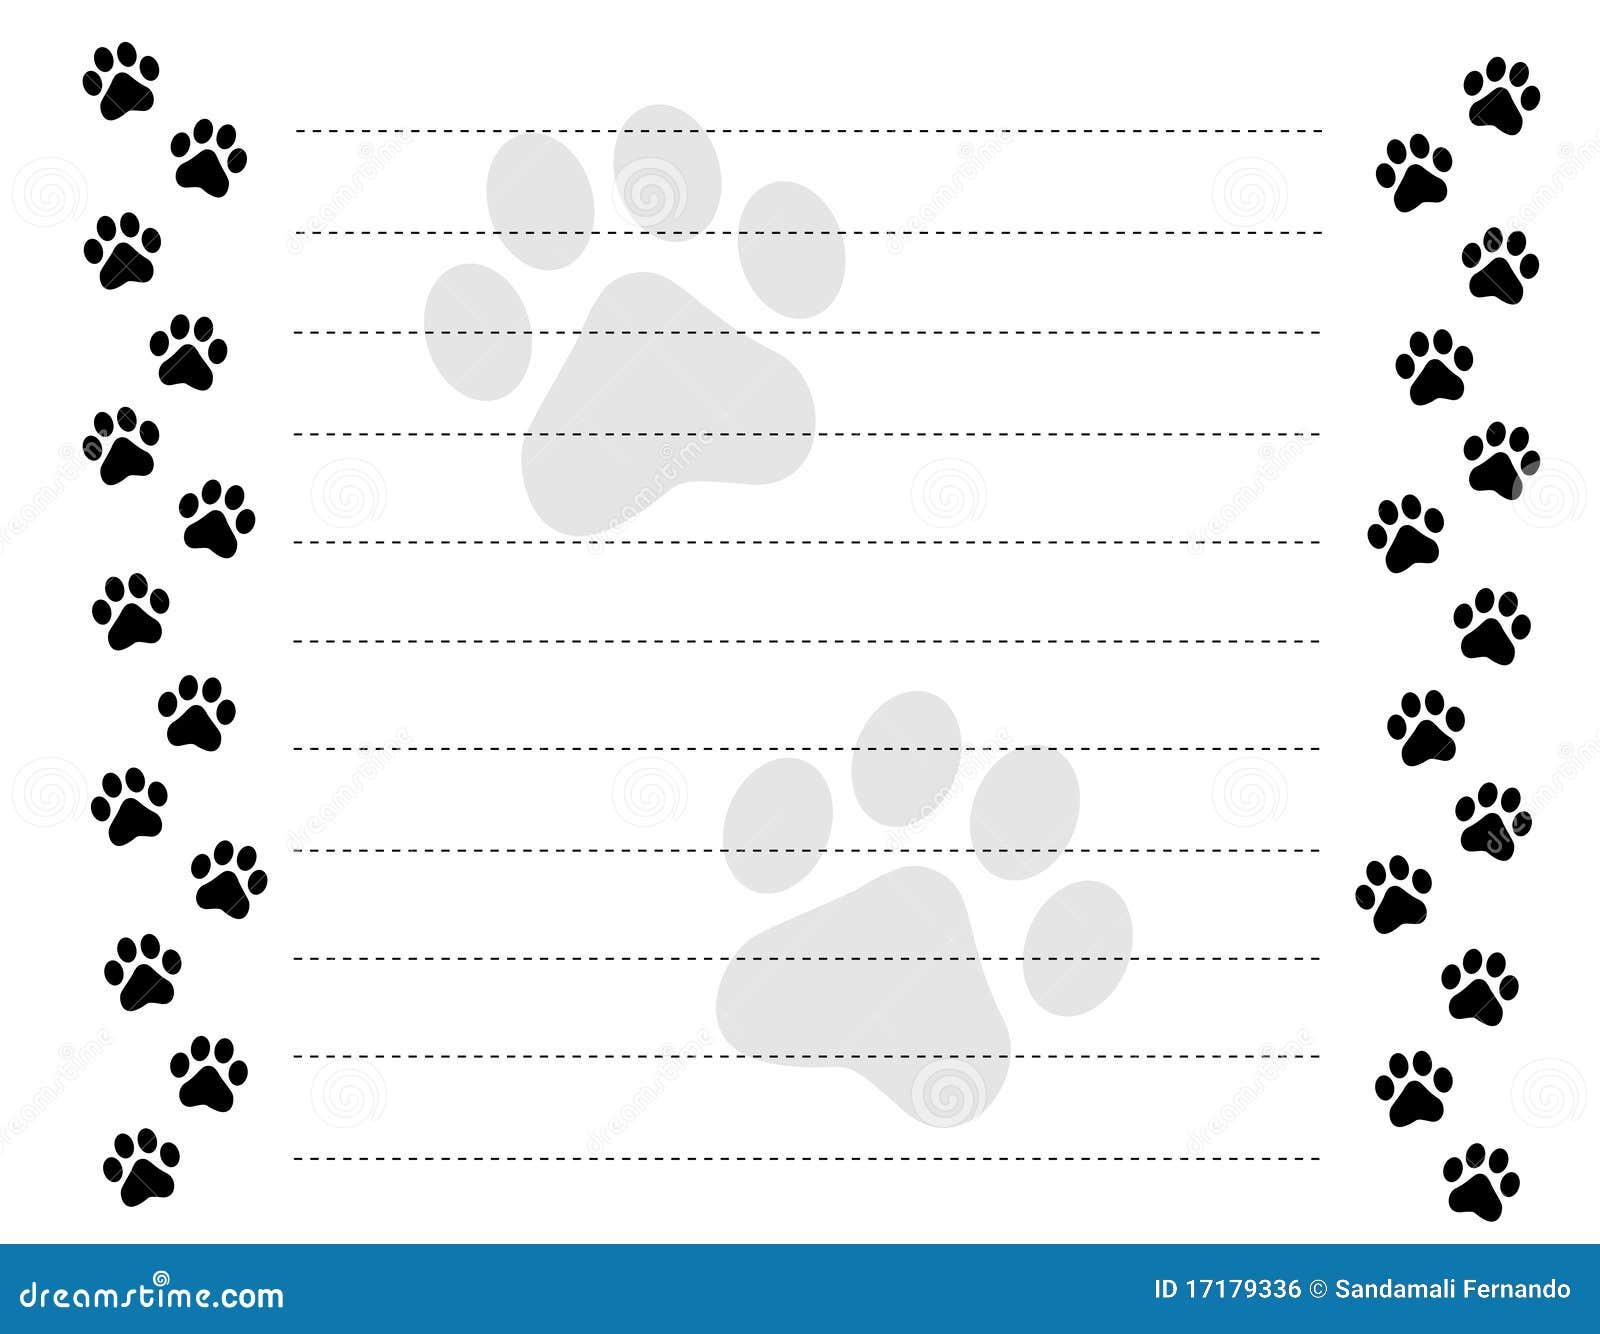 paw prints border royalty free stock image  image 17179336